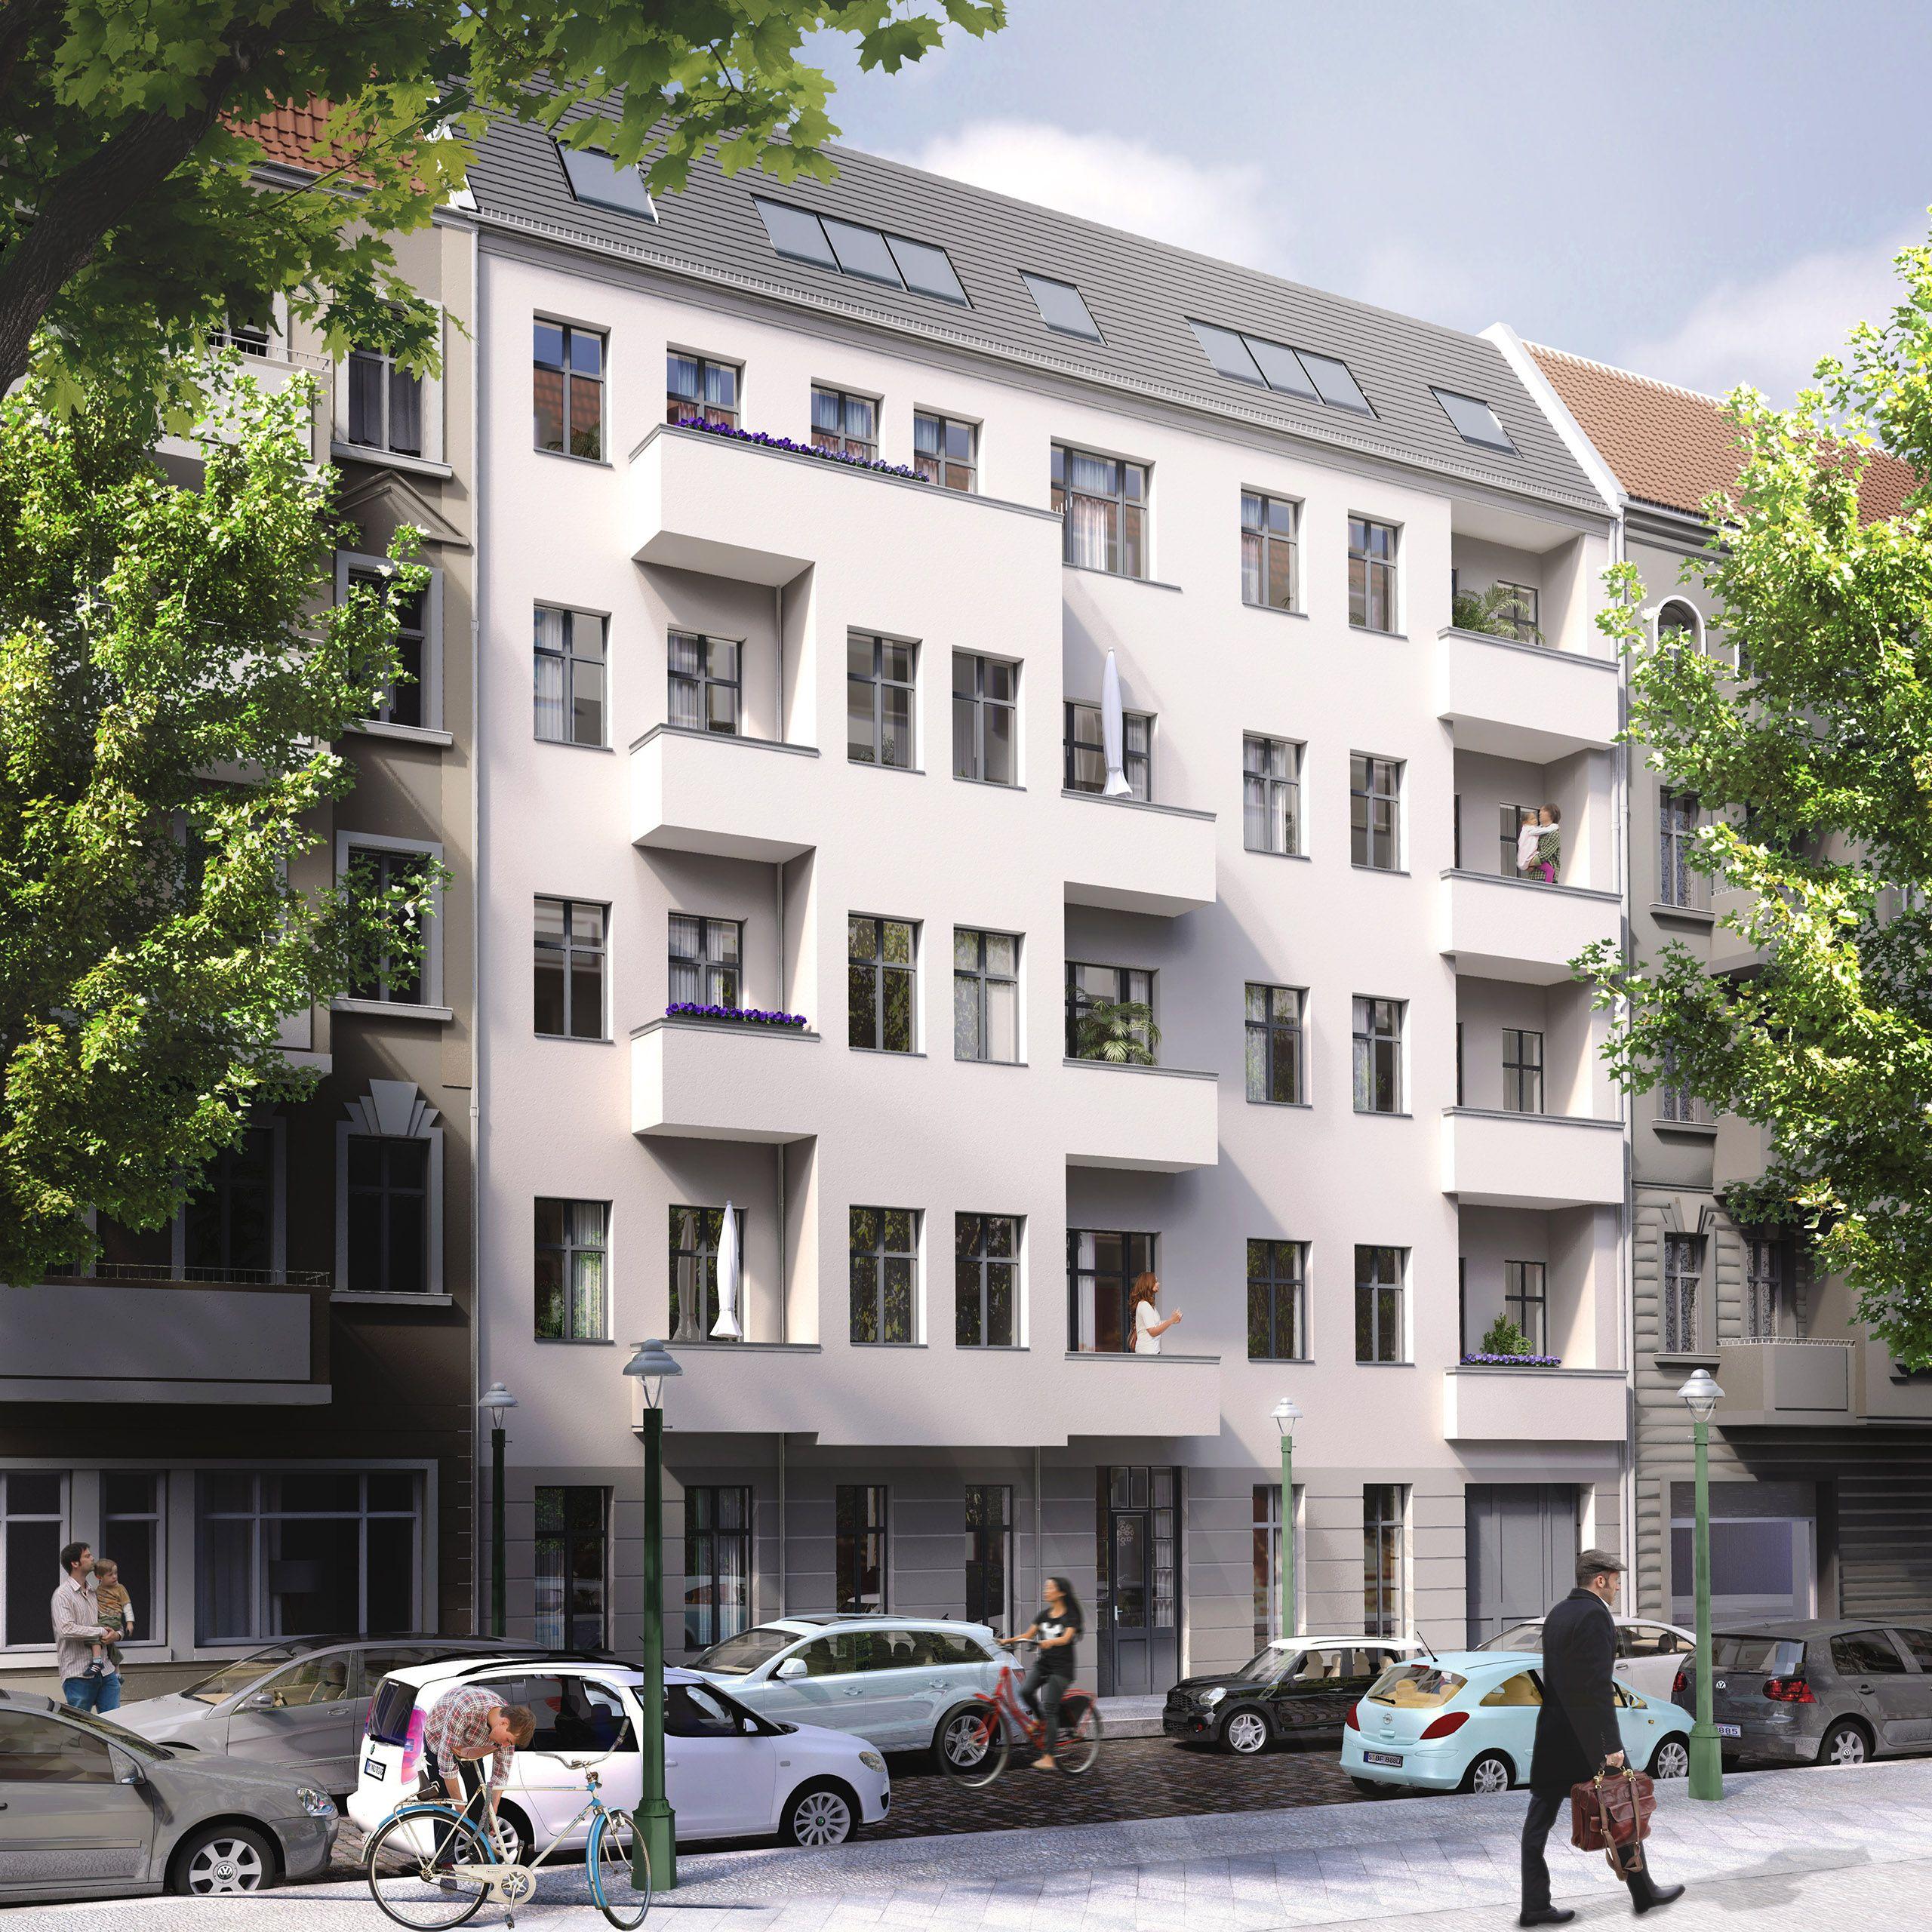 Visualisierung Berlin berlin neukölln refurbishment rooftop render manufaktur